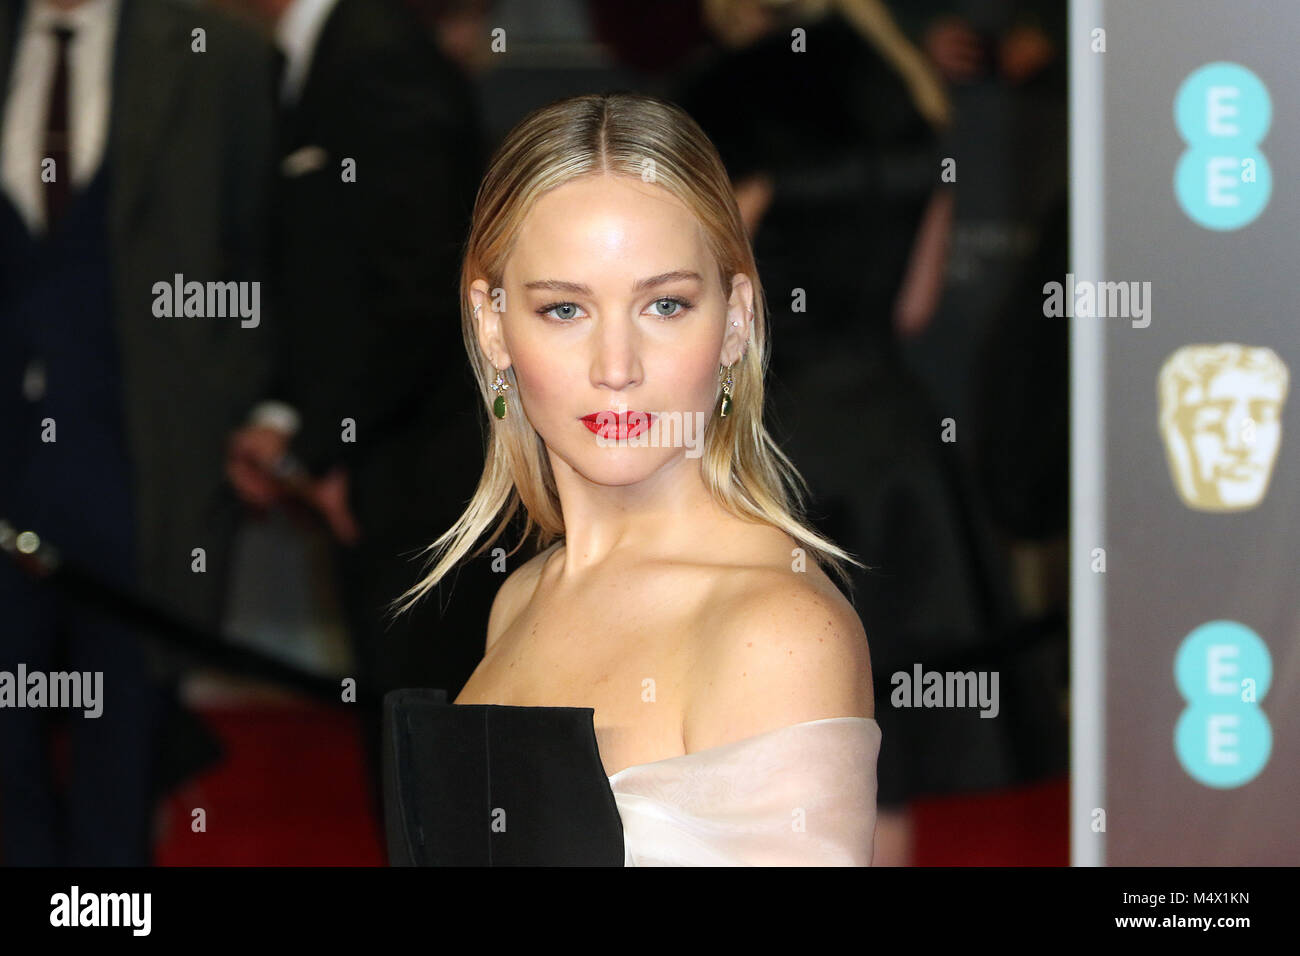 London, UK. 18th Feb, 2018. Jennifer Lawrence, EE British Academy Film Awards (BAFTAs) - Royal Albert Hall, London - Stock Image